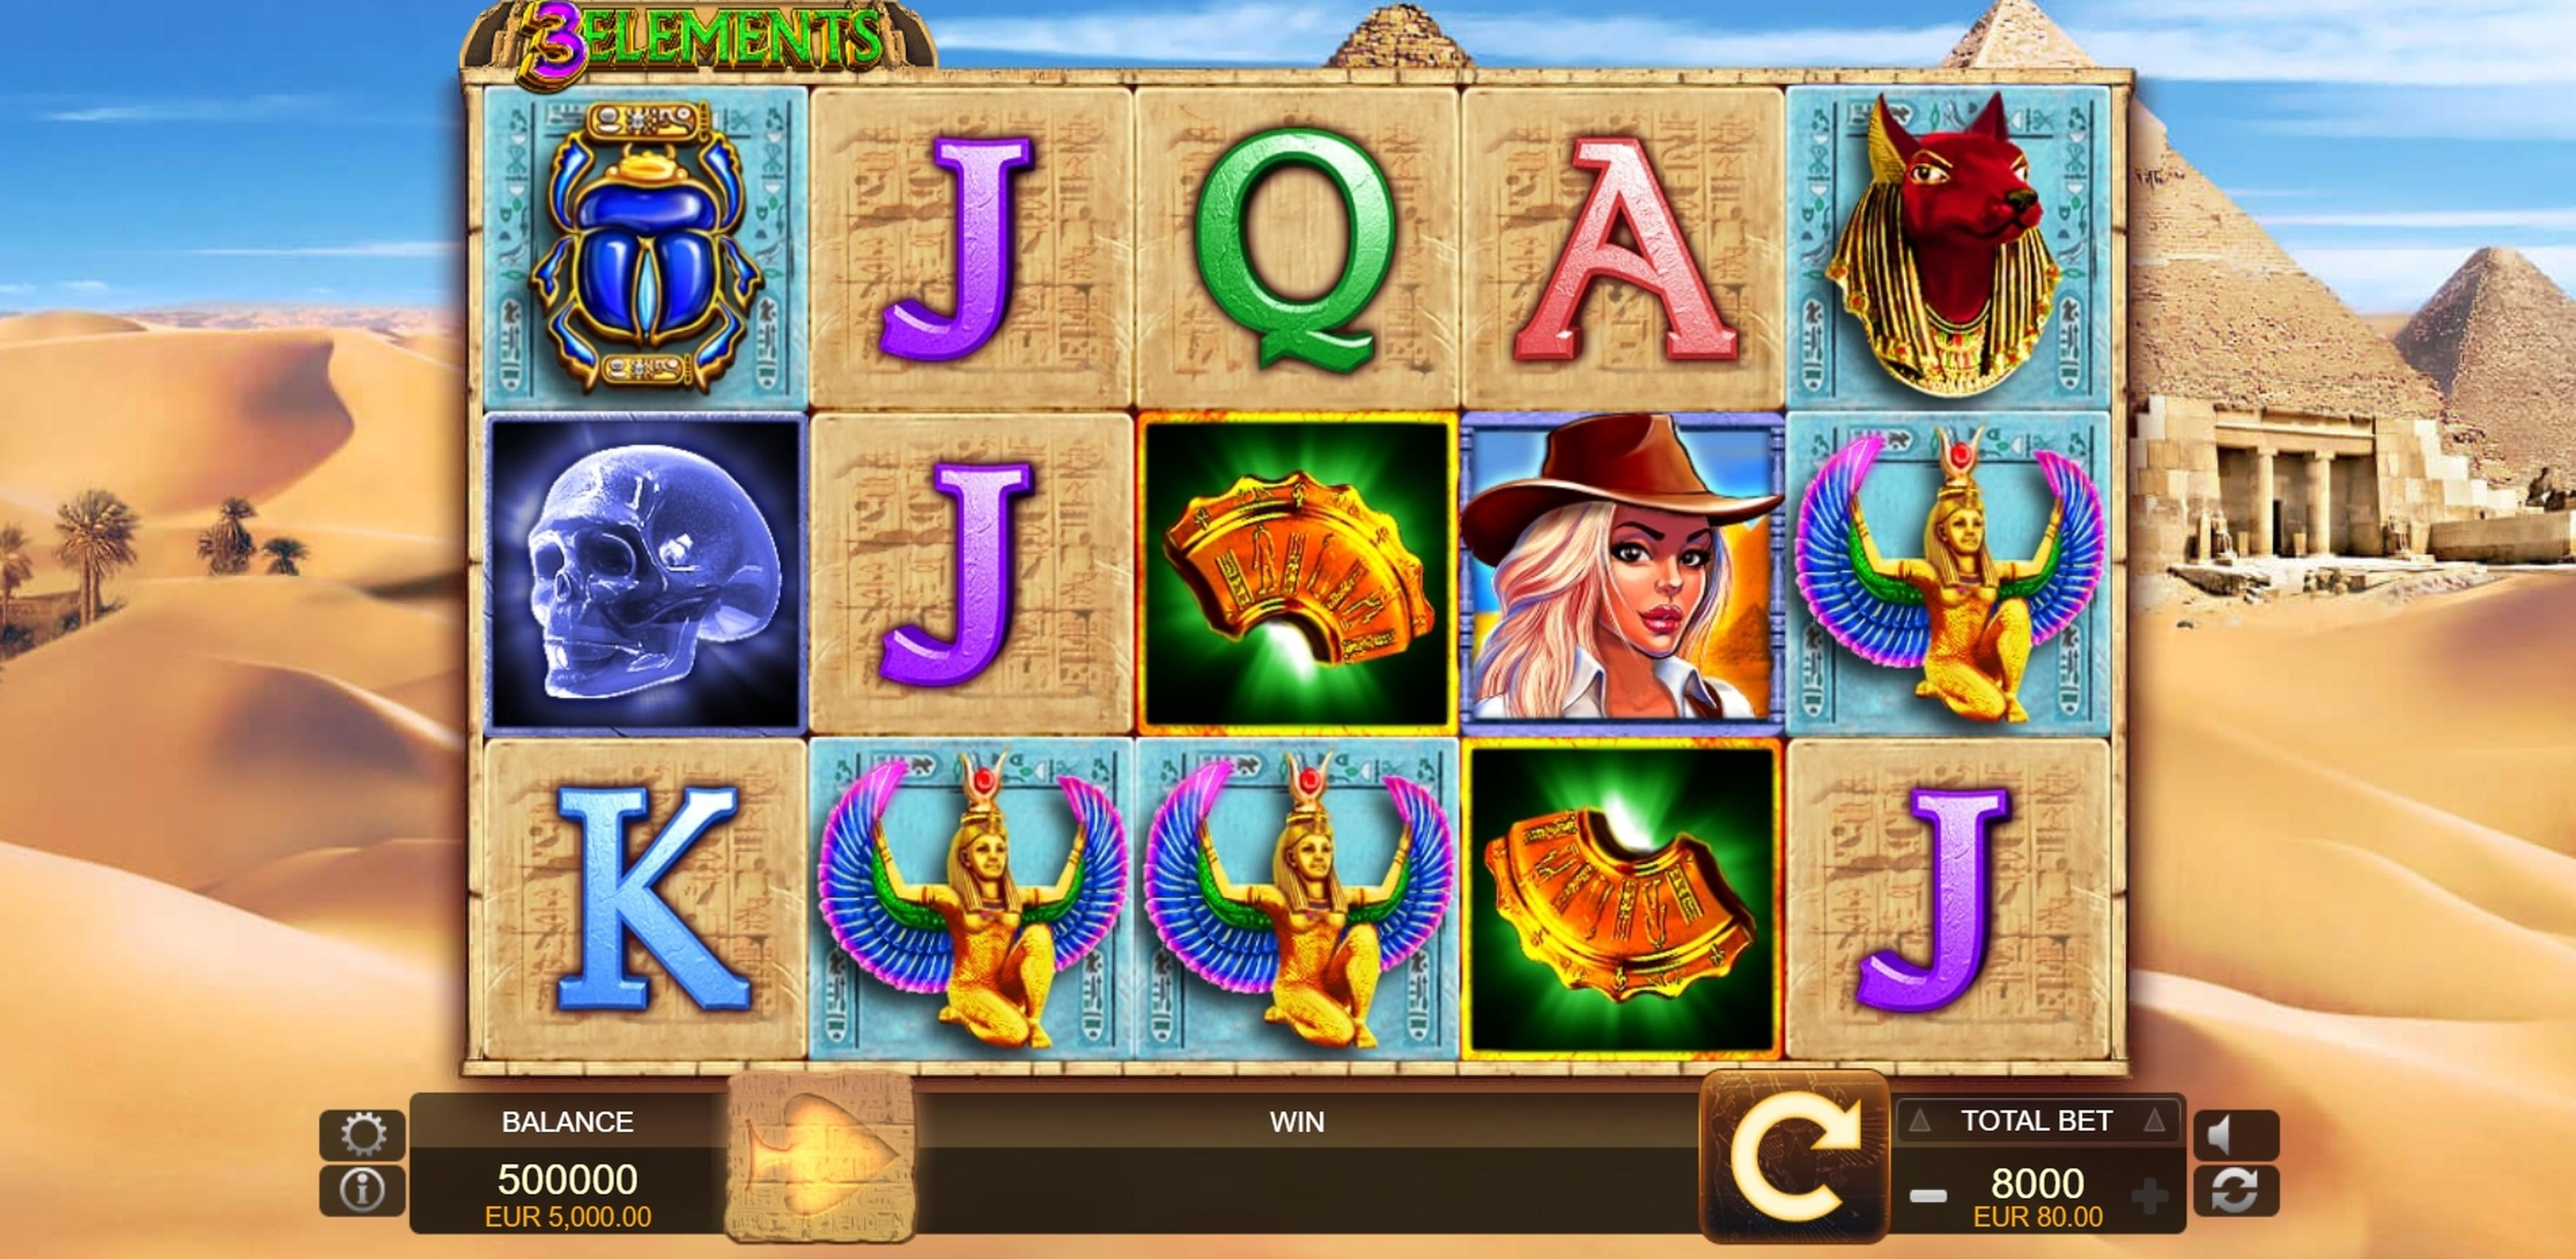 3 elements fuga gaming casino slots money strategy